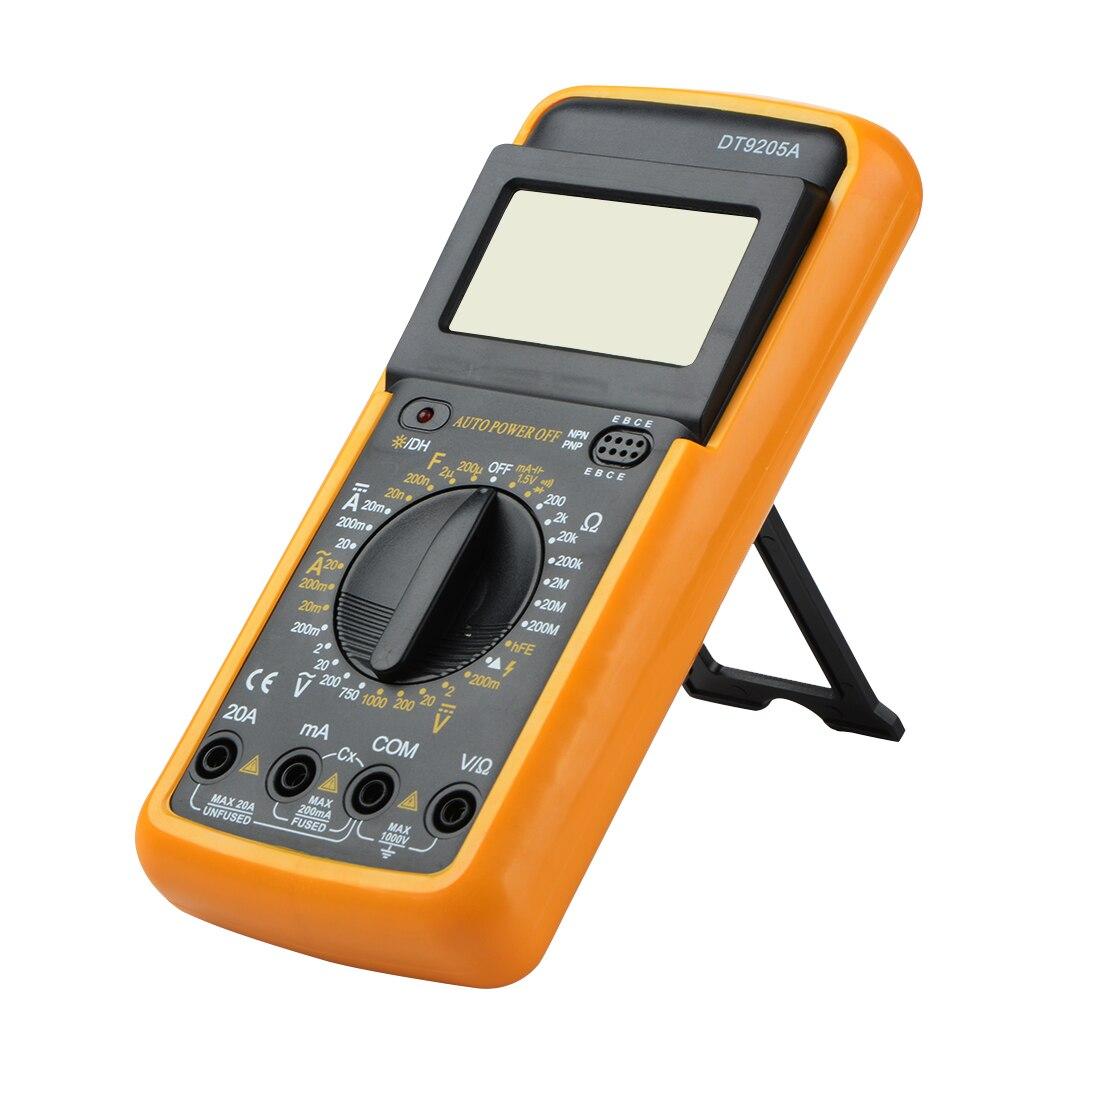 DT9205A Professional Electric Handheld Tester Meter Digital Multimeter Ammeter Portable Multitester AC DC LCD Display dt9205a lcd display multi fuction digital multimeter tester ac dc black